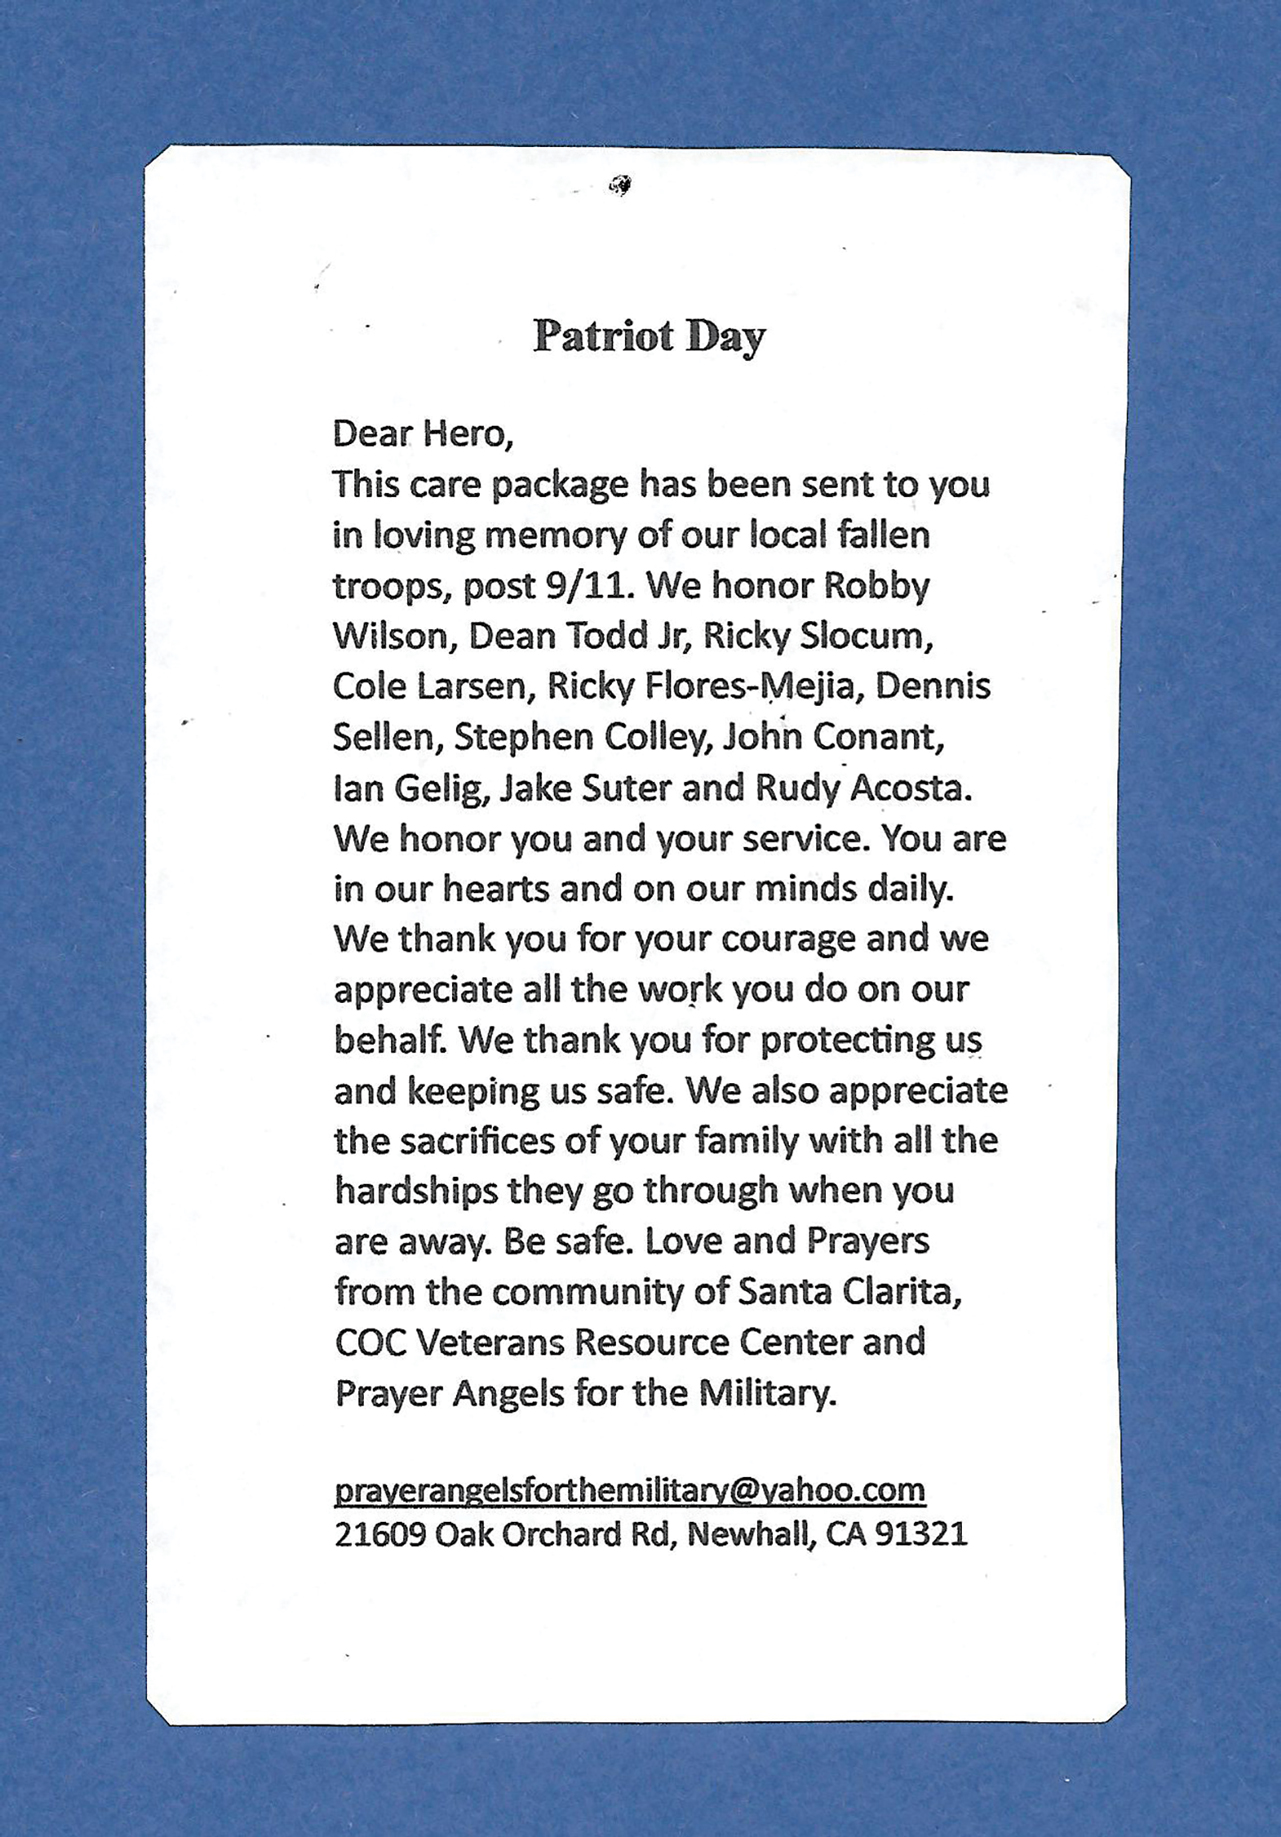 COM-PrayerAngelsTY-11